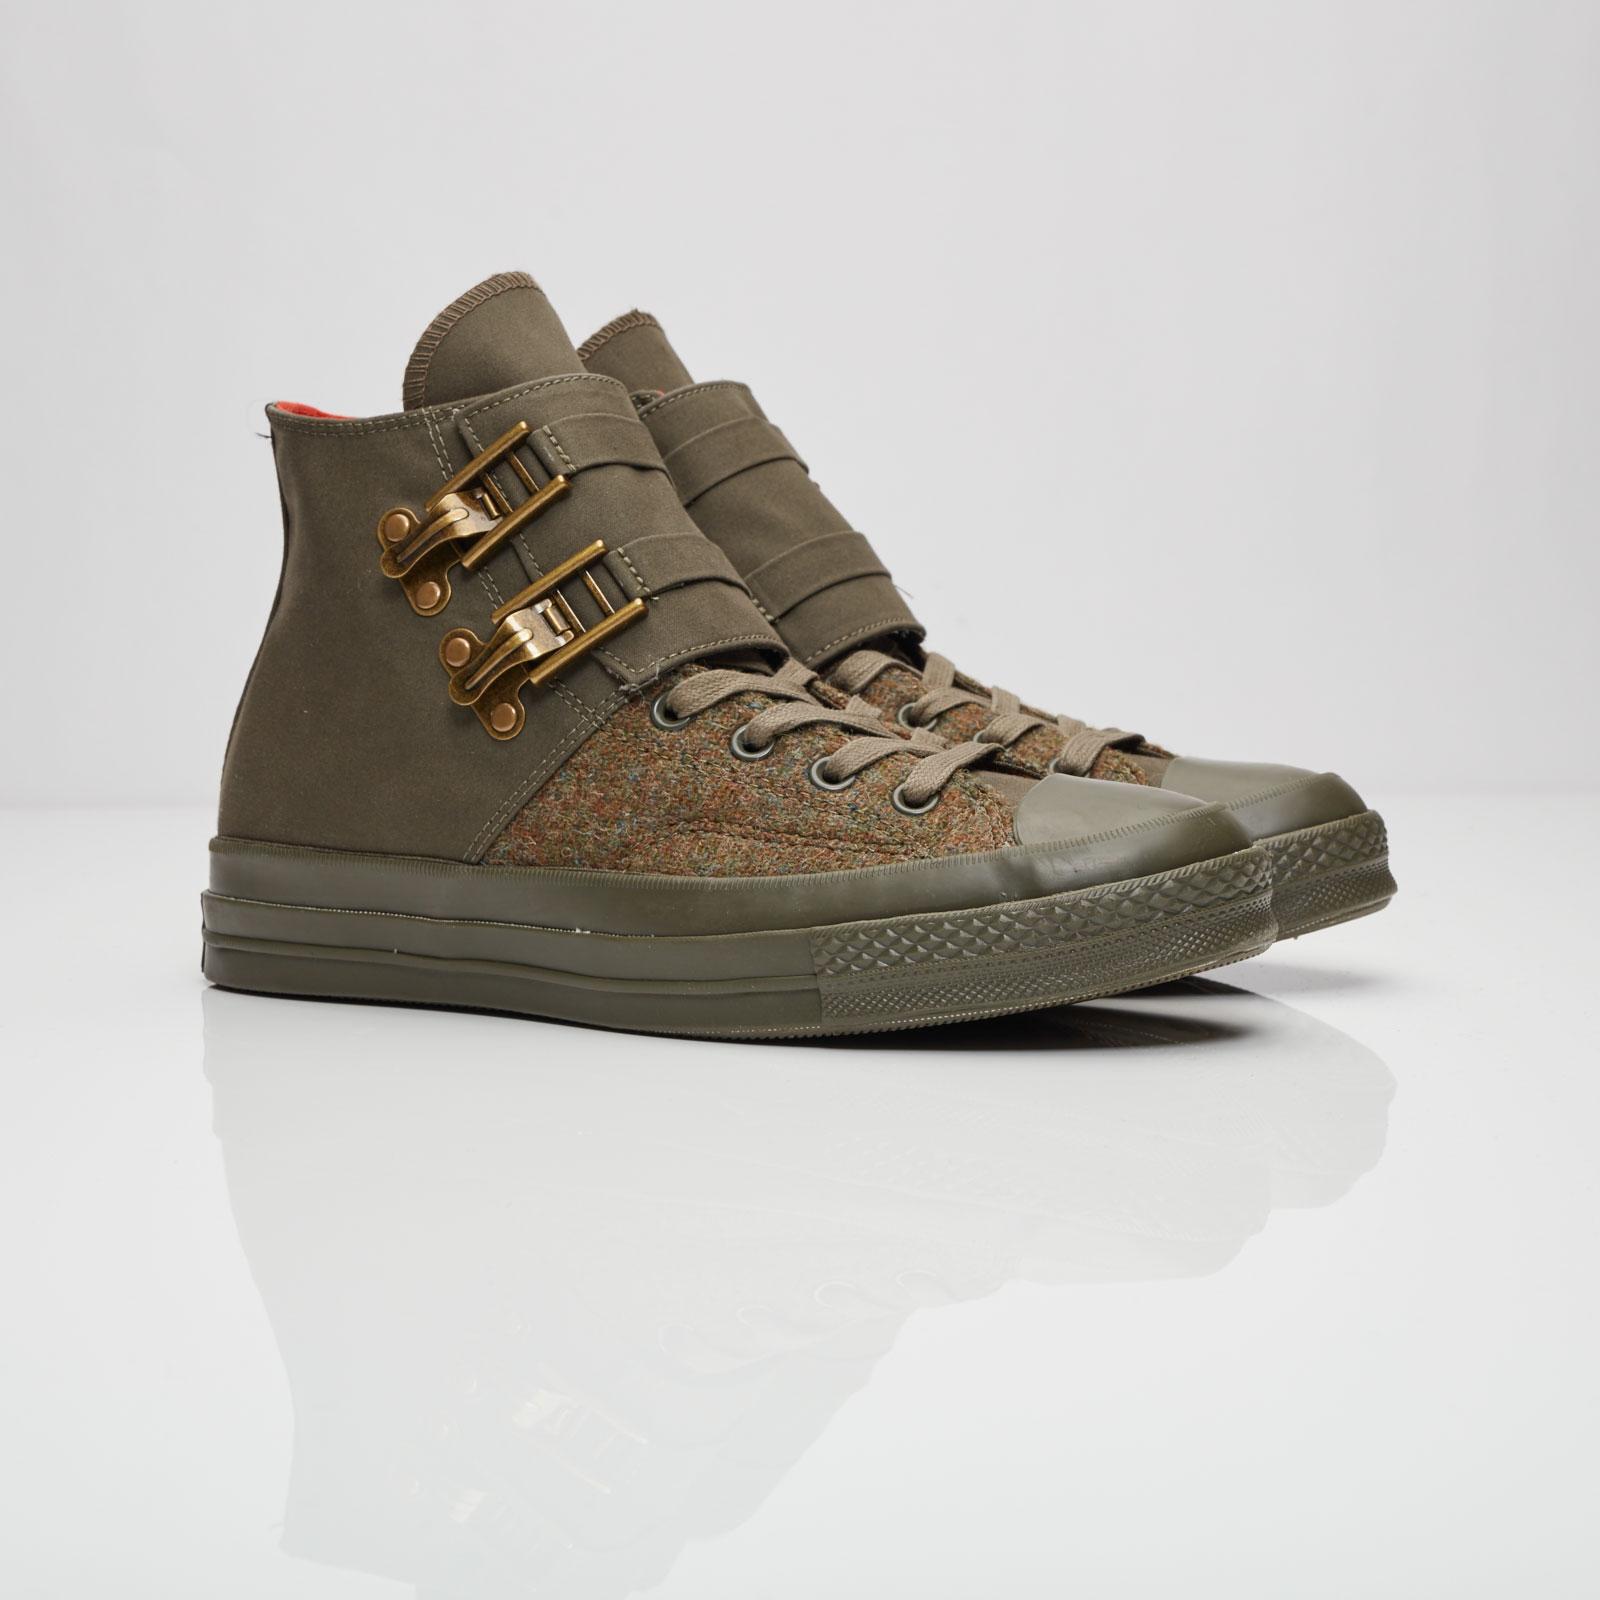 e65e6239094a19 Converse Chuck Taylor 70 Nigel Cabourn - 155333c - Sneakersnstuff ...